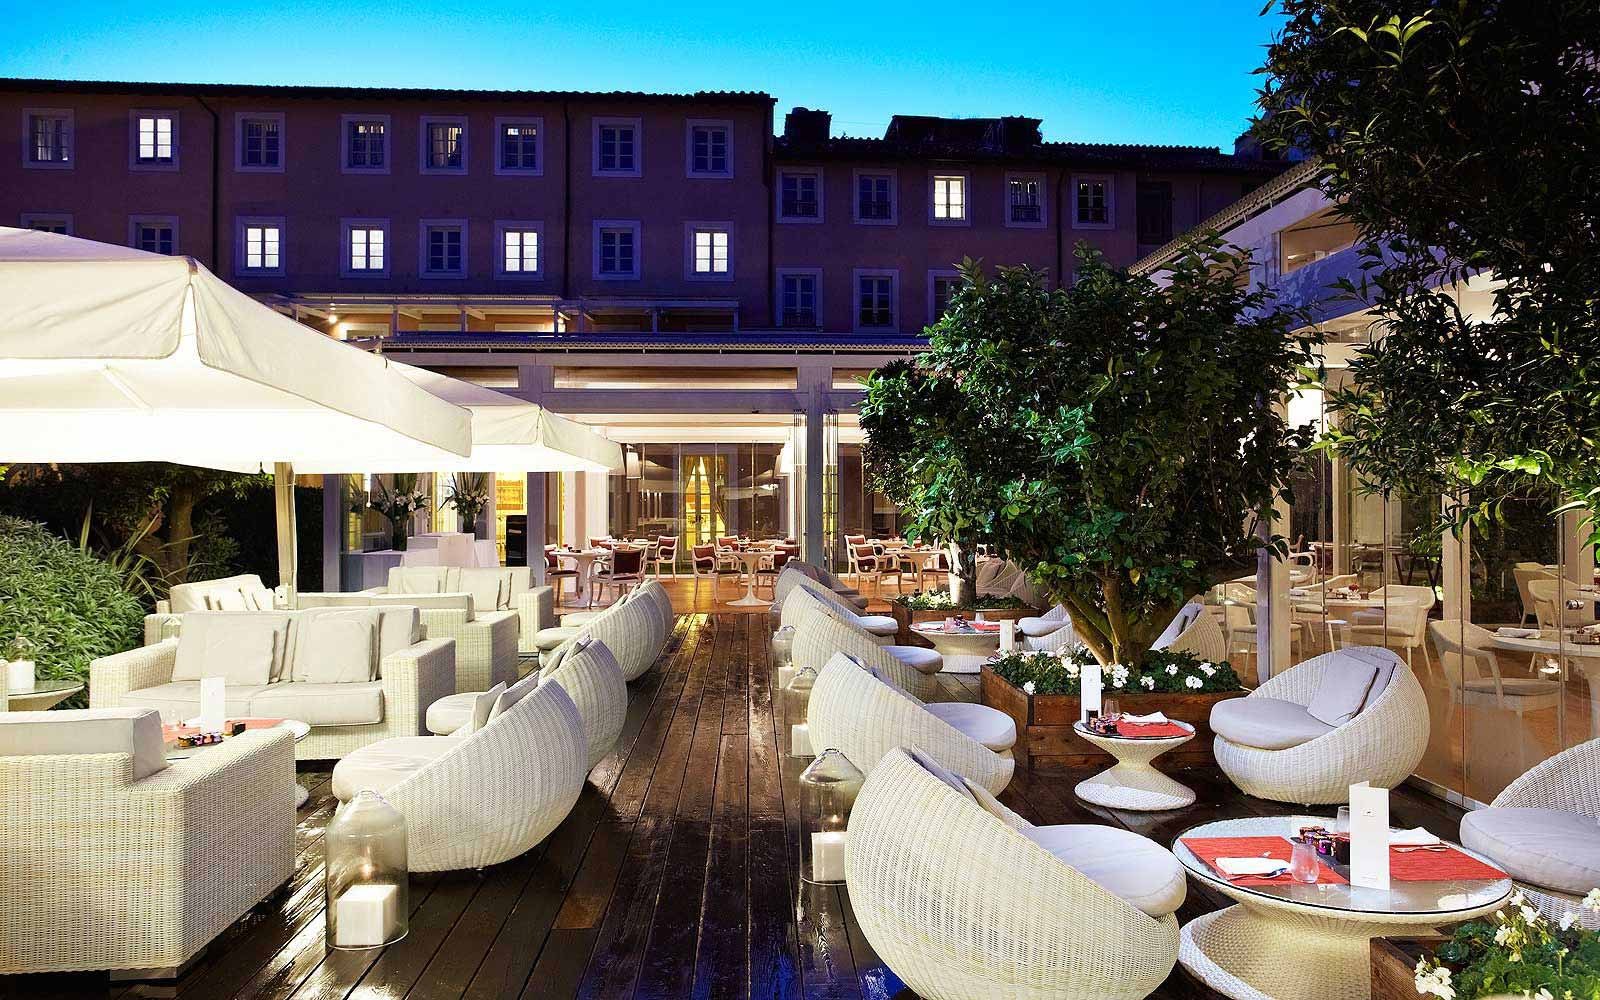 Gran meli rome hotel sardatur holidays for Gran melia rome